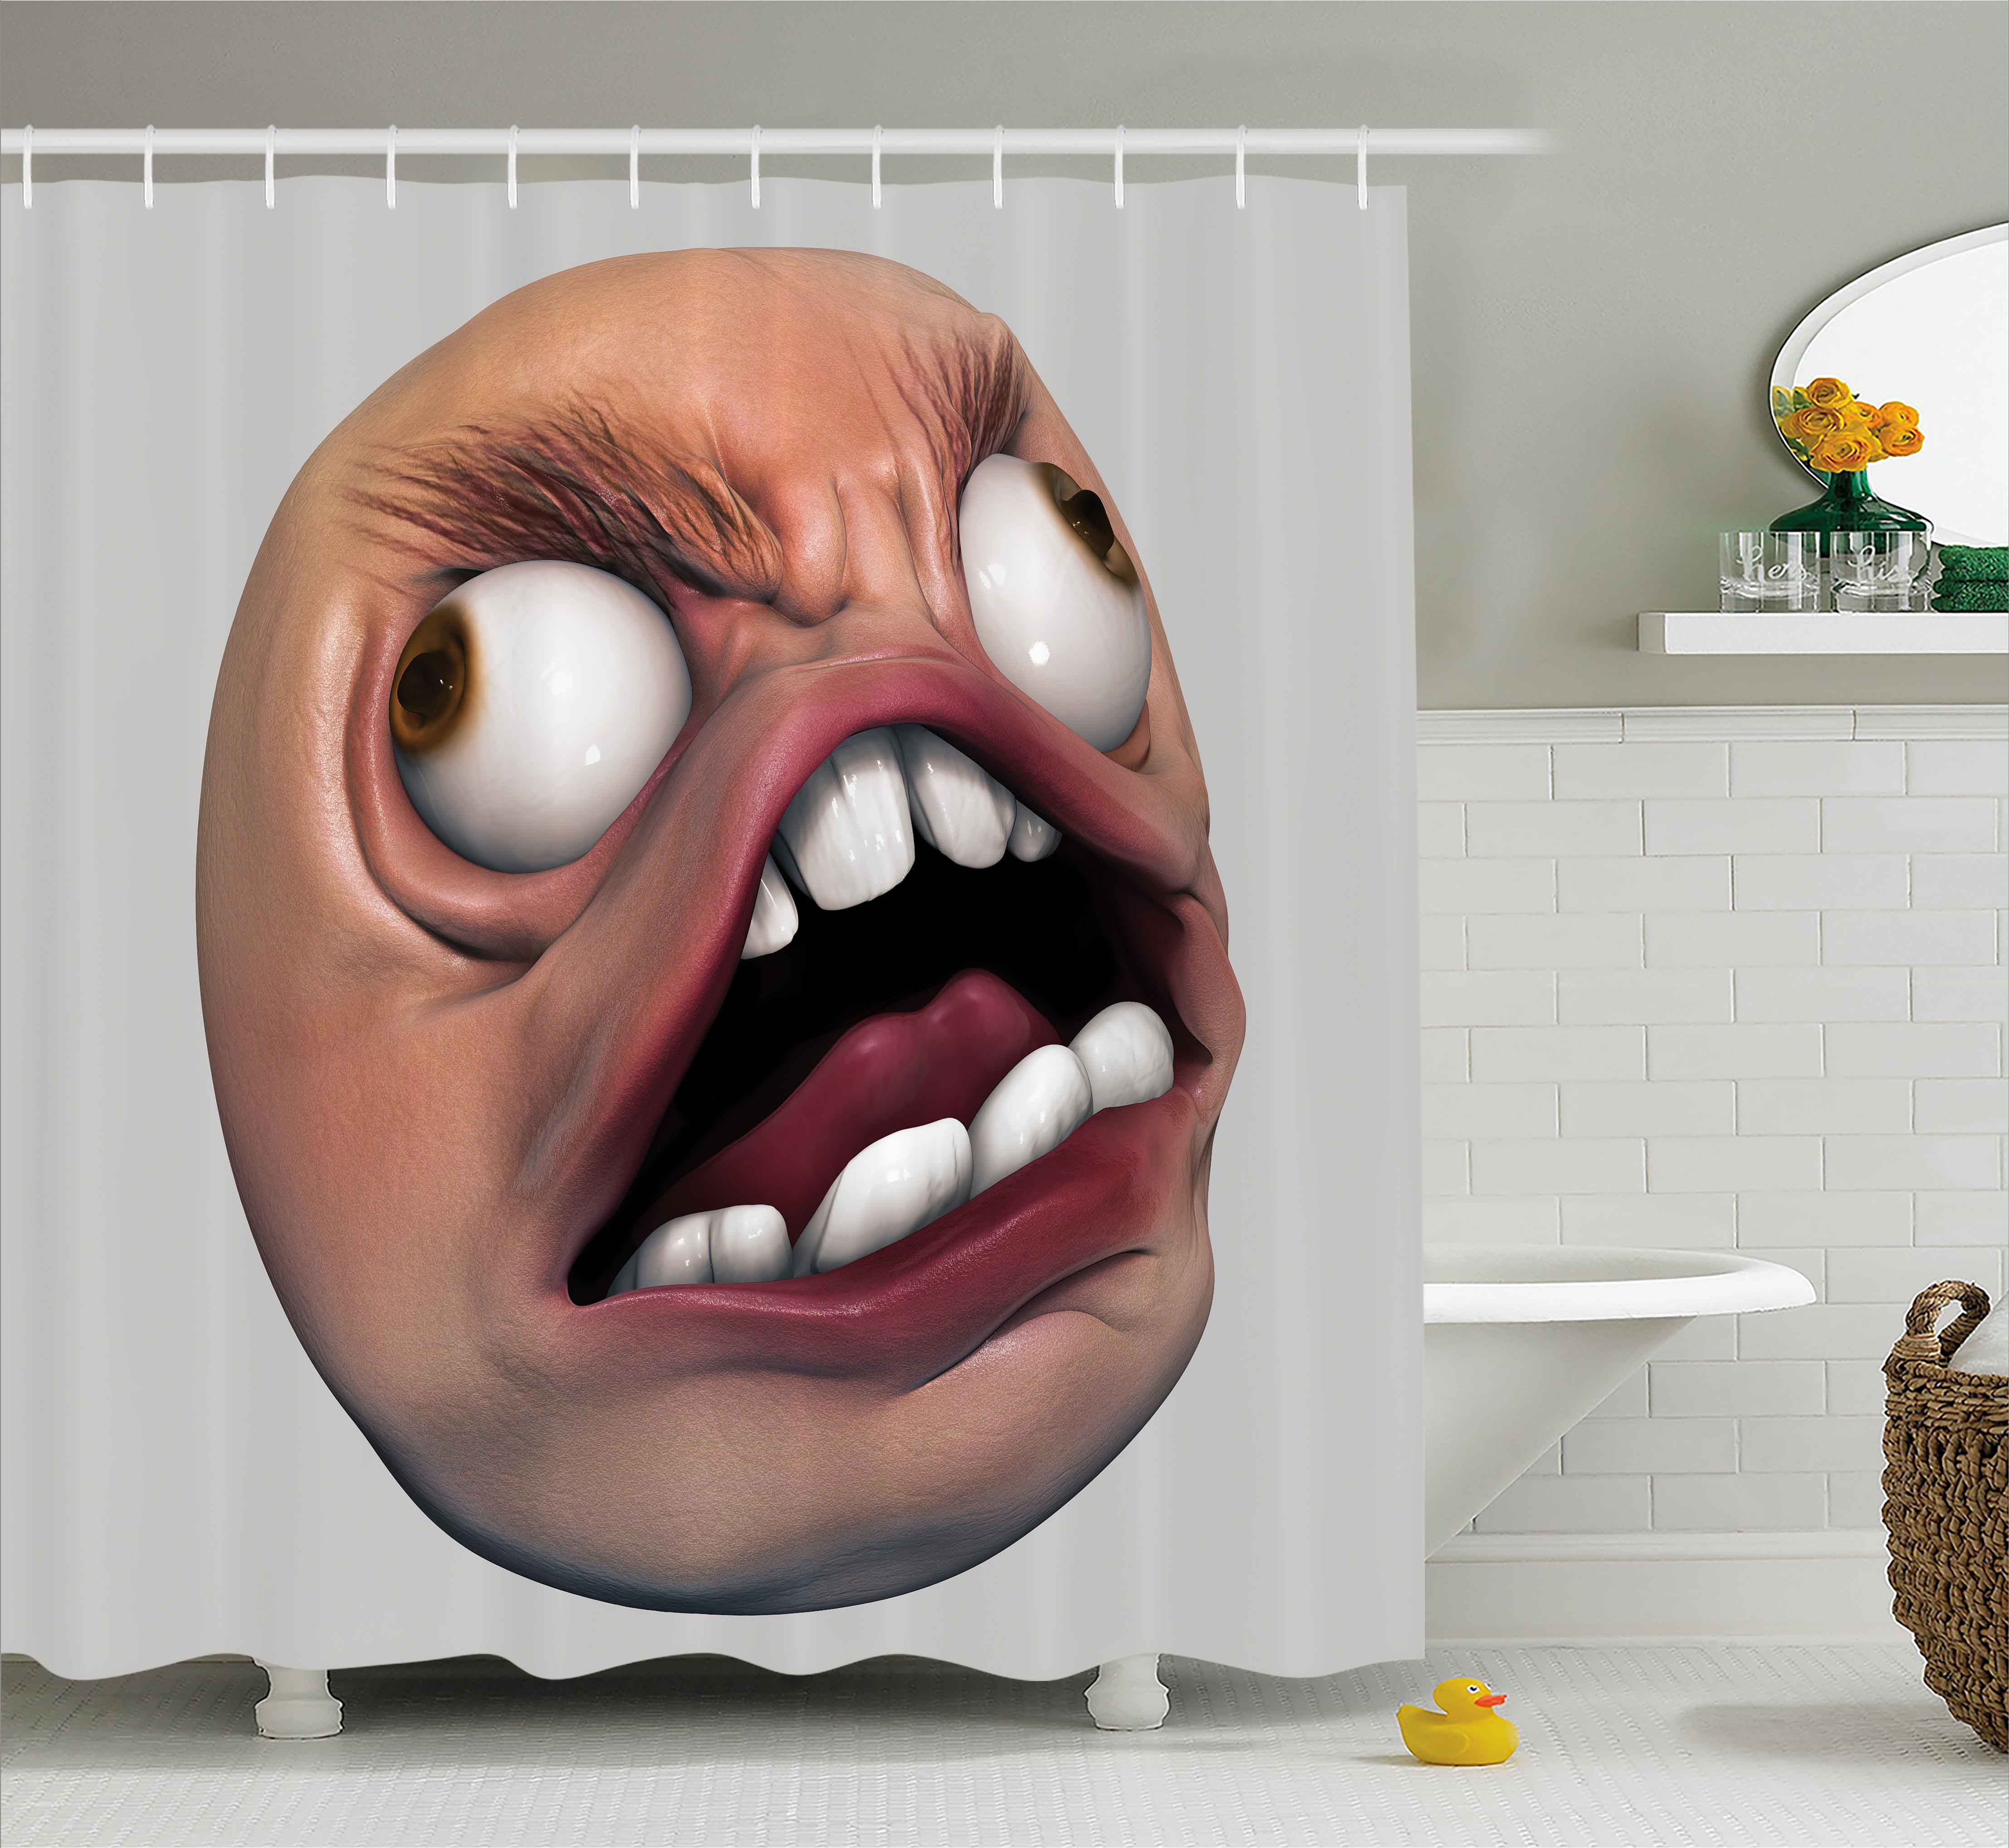 Humor Shower Curtain Angry Rage Guy Meme Bad Hair Day Late Work